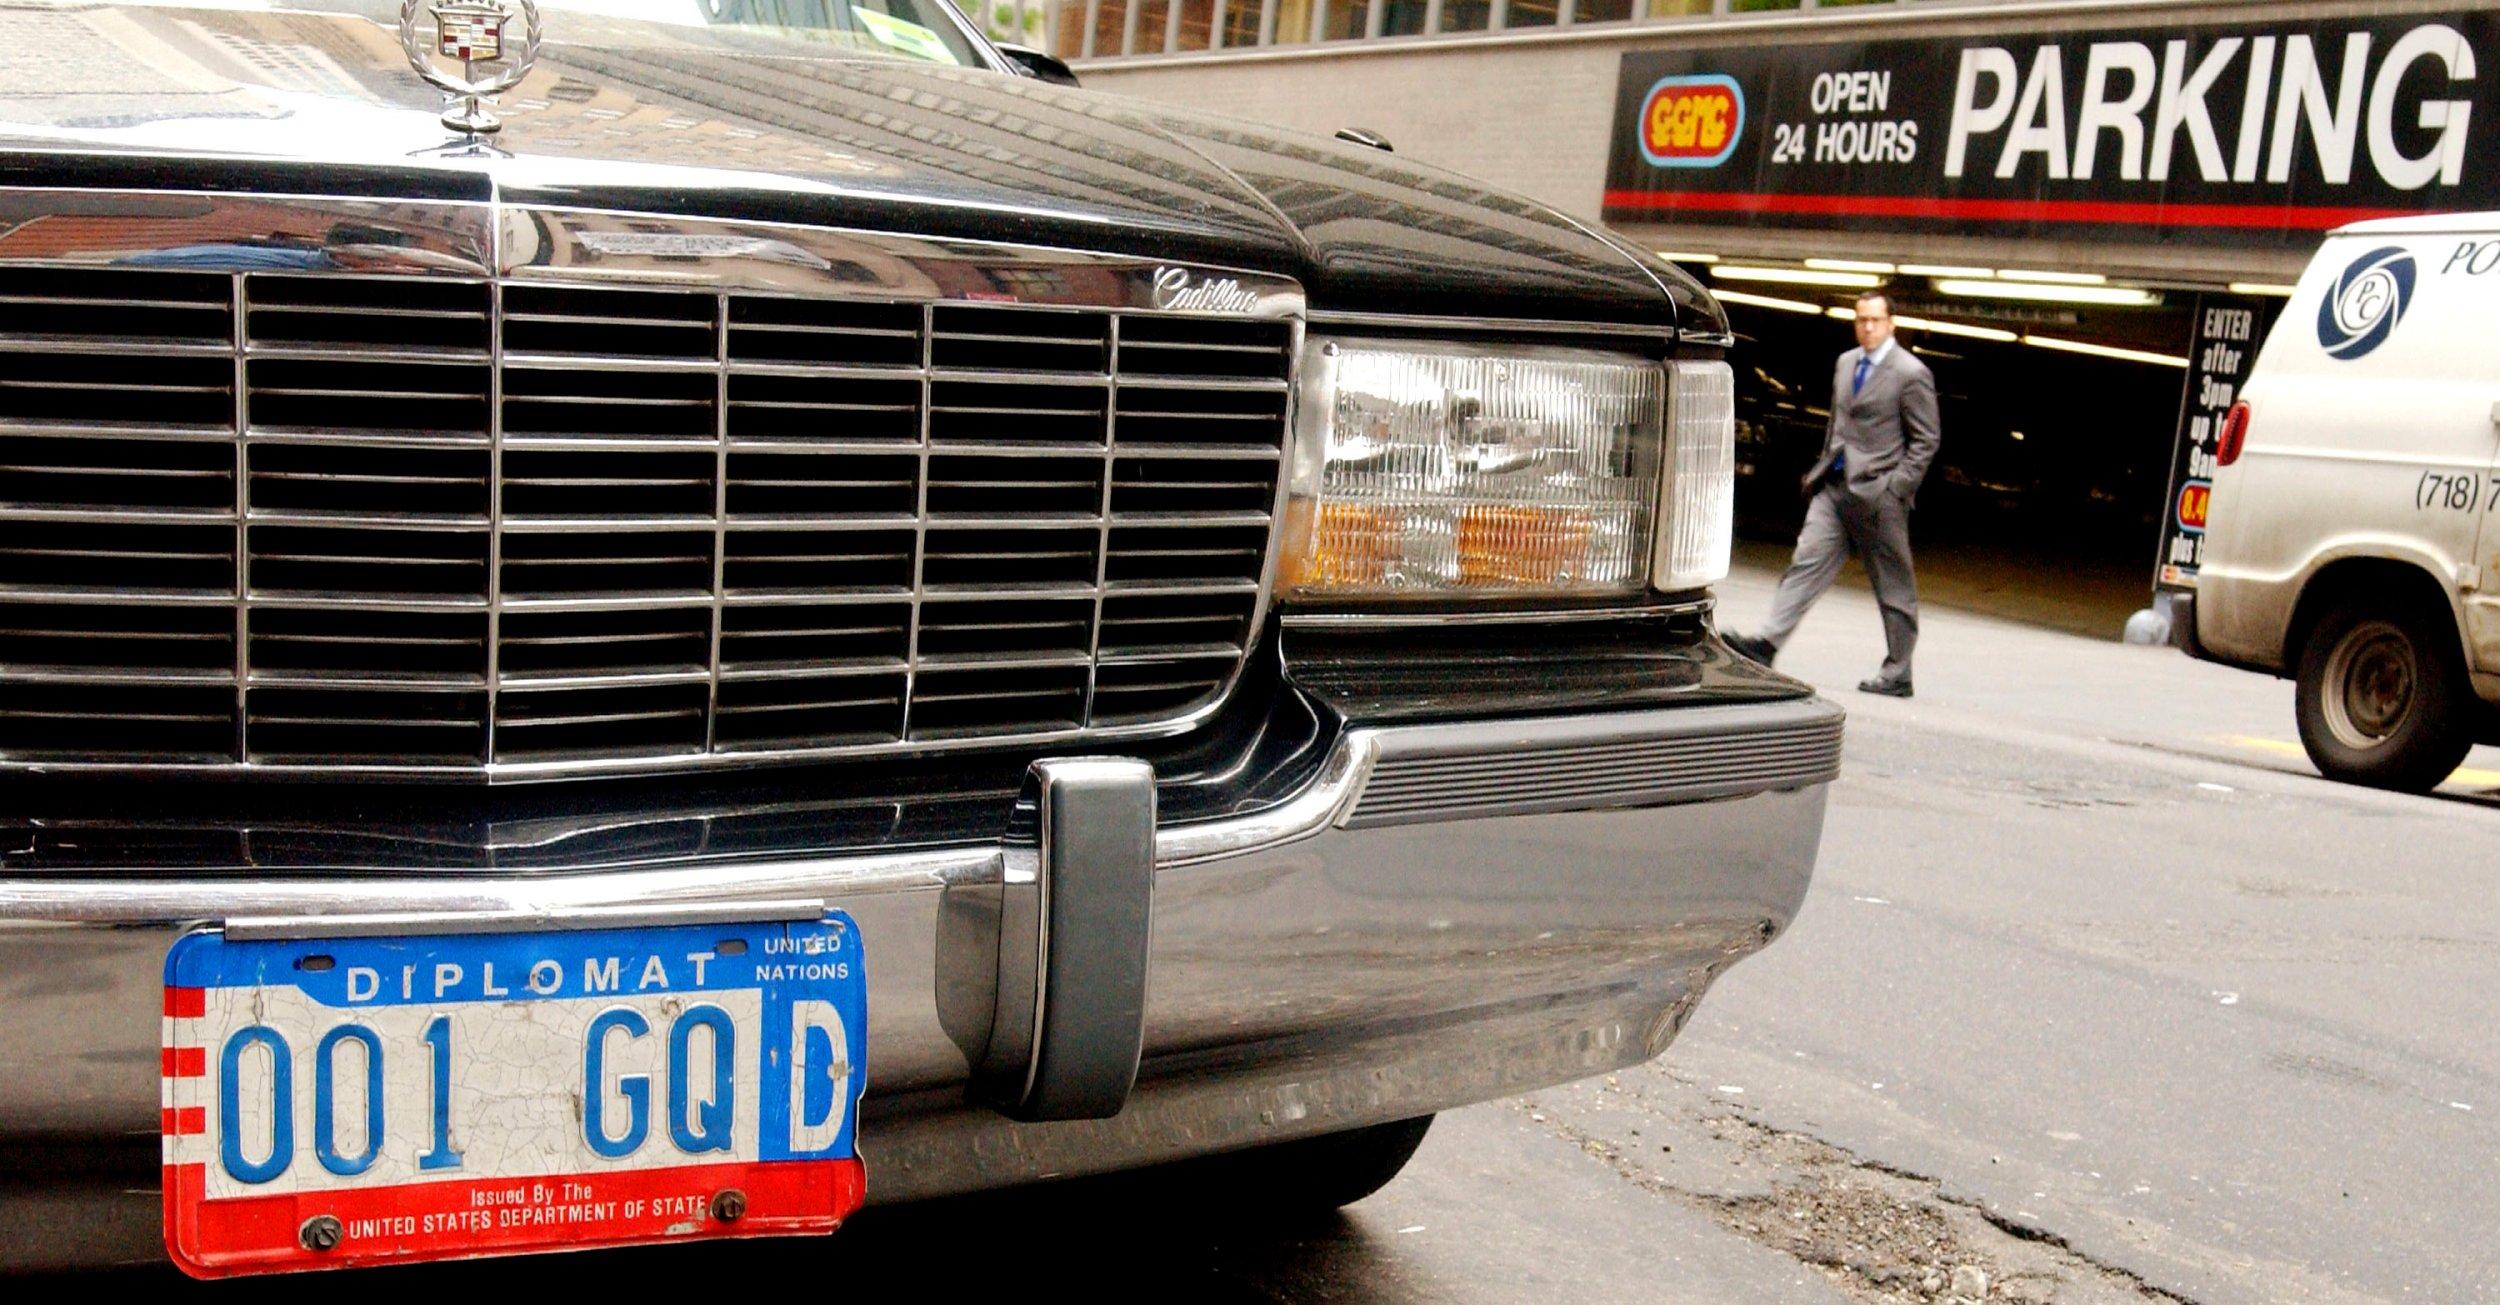 Diplomatic plates car New York City